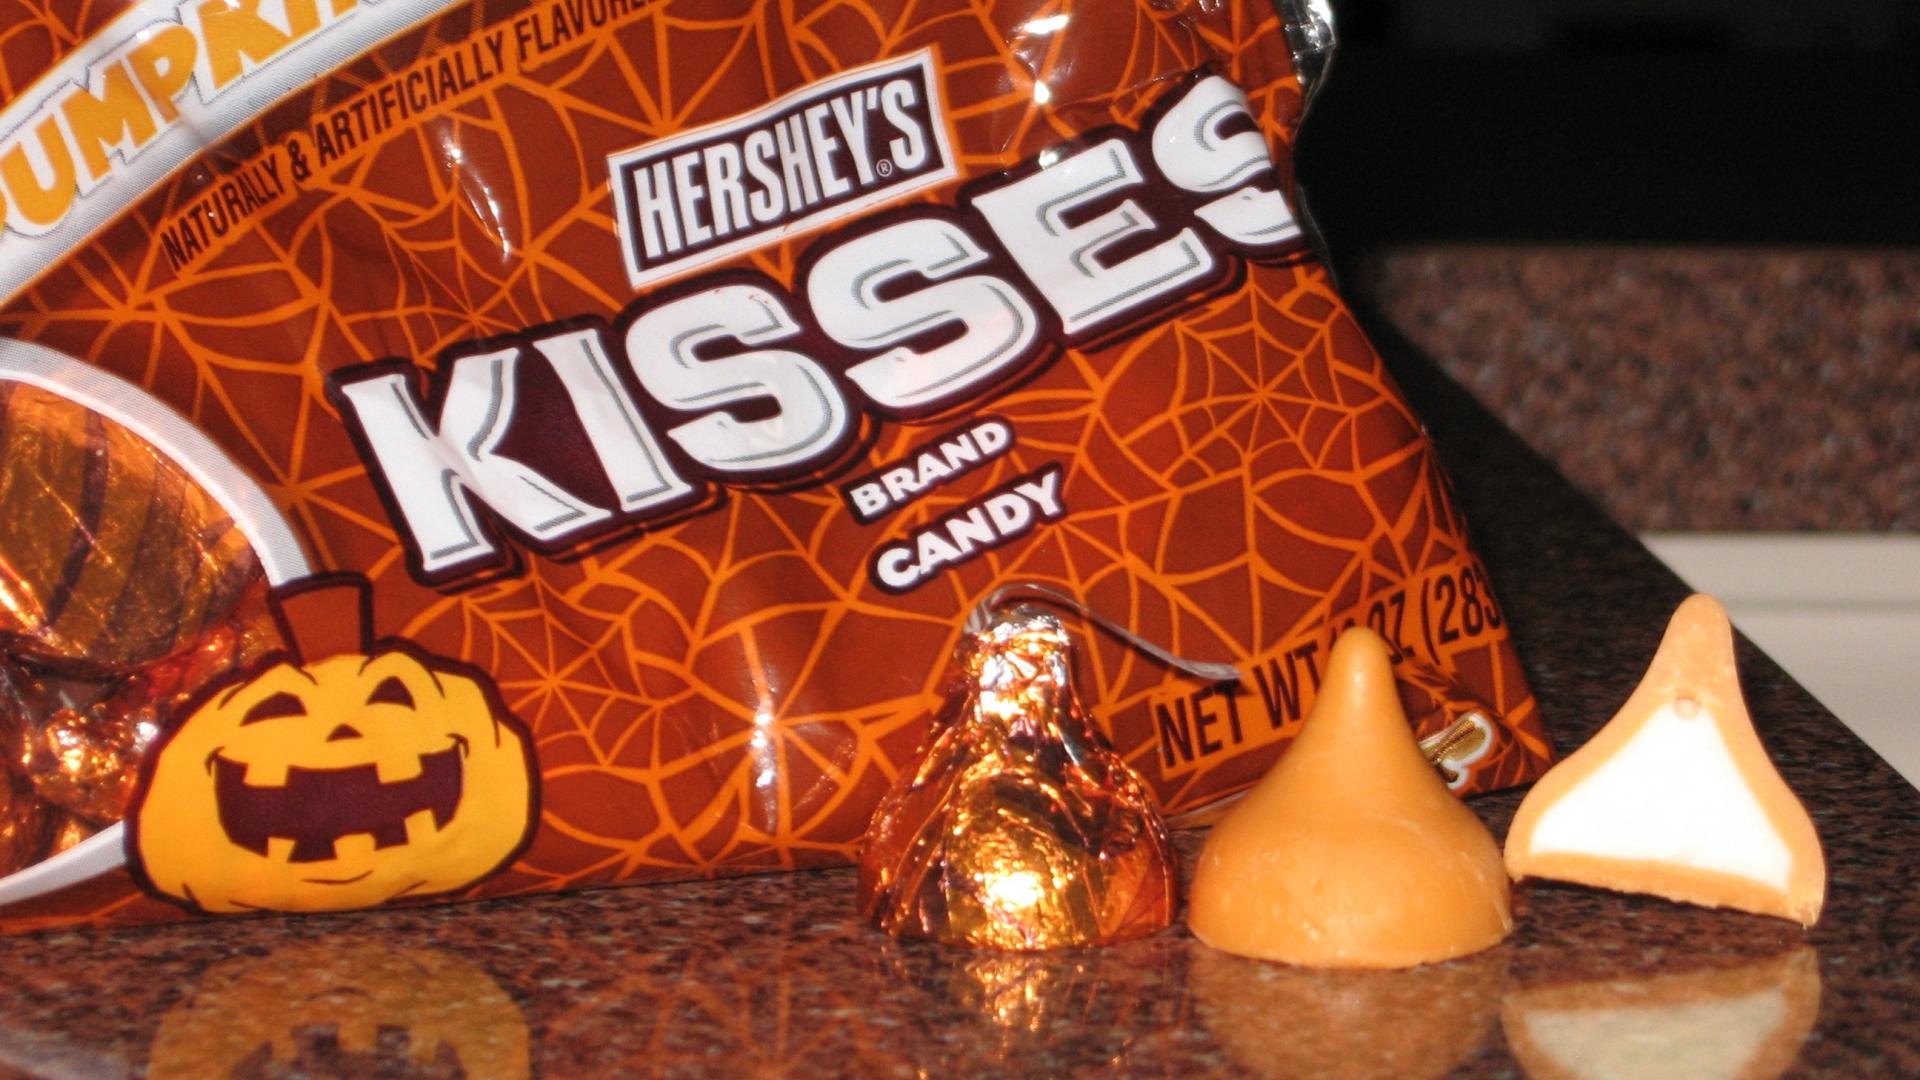 download Hershey Kisses Wallpaper Spice hershey kisses 1920x1080